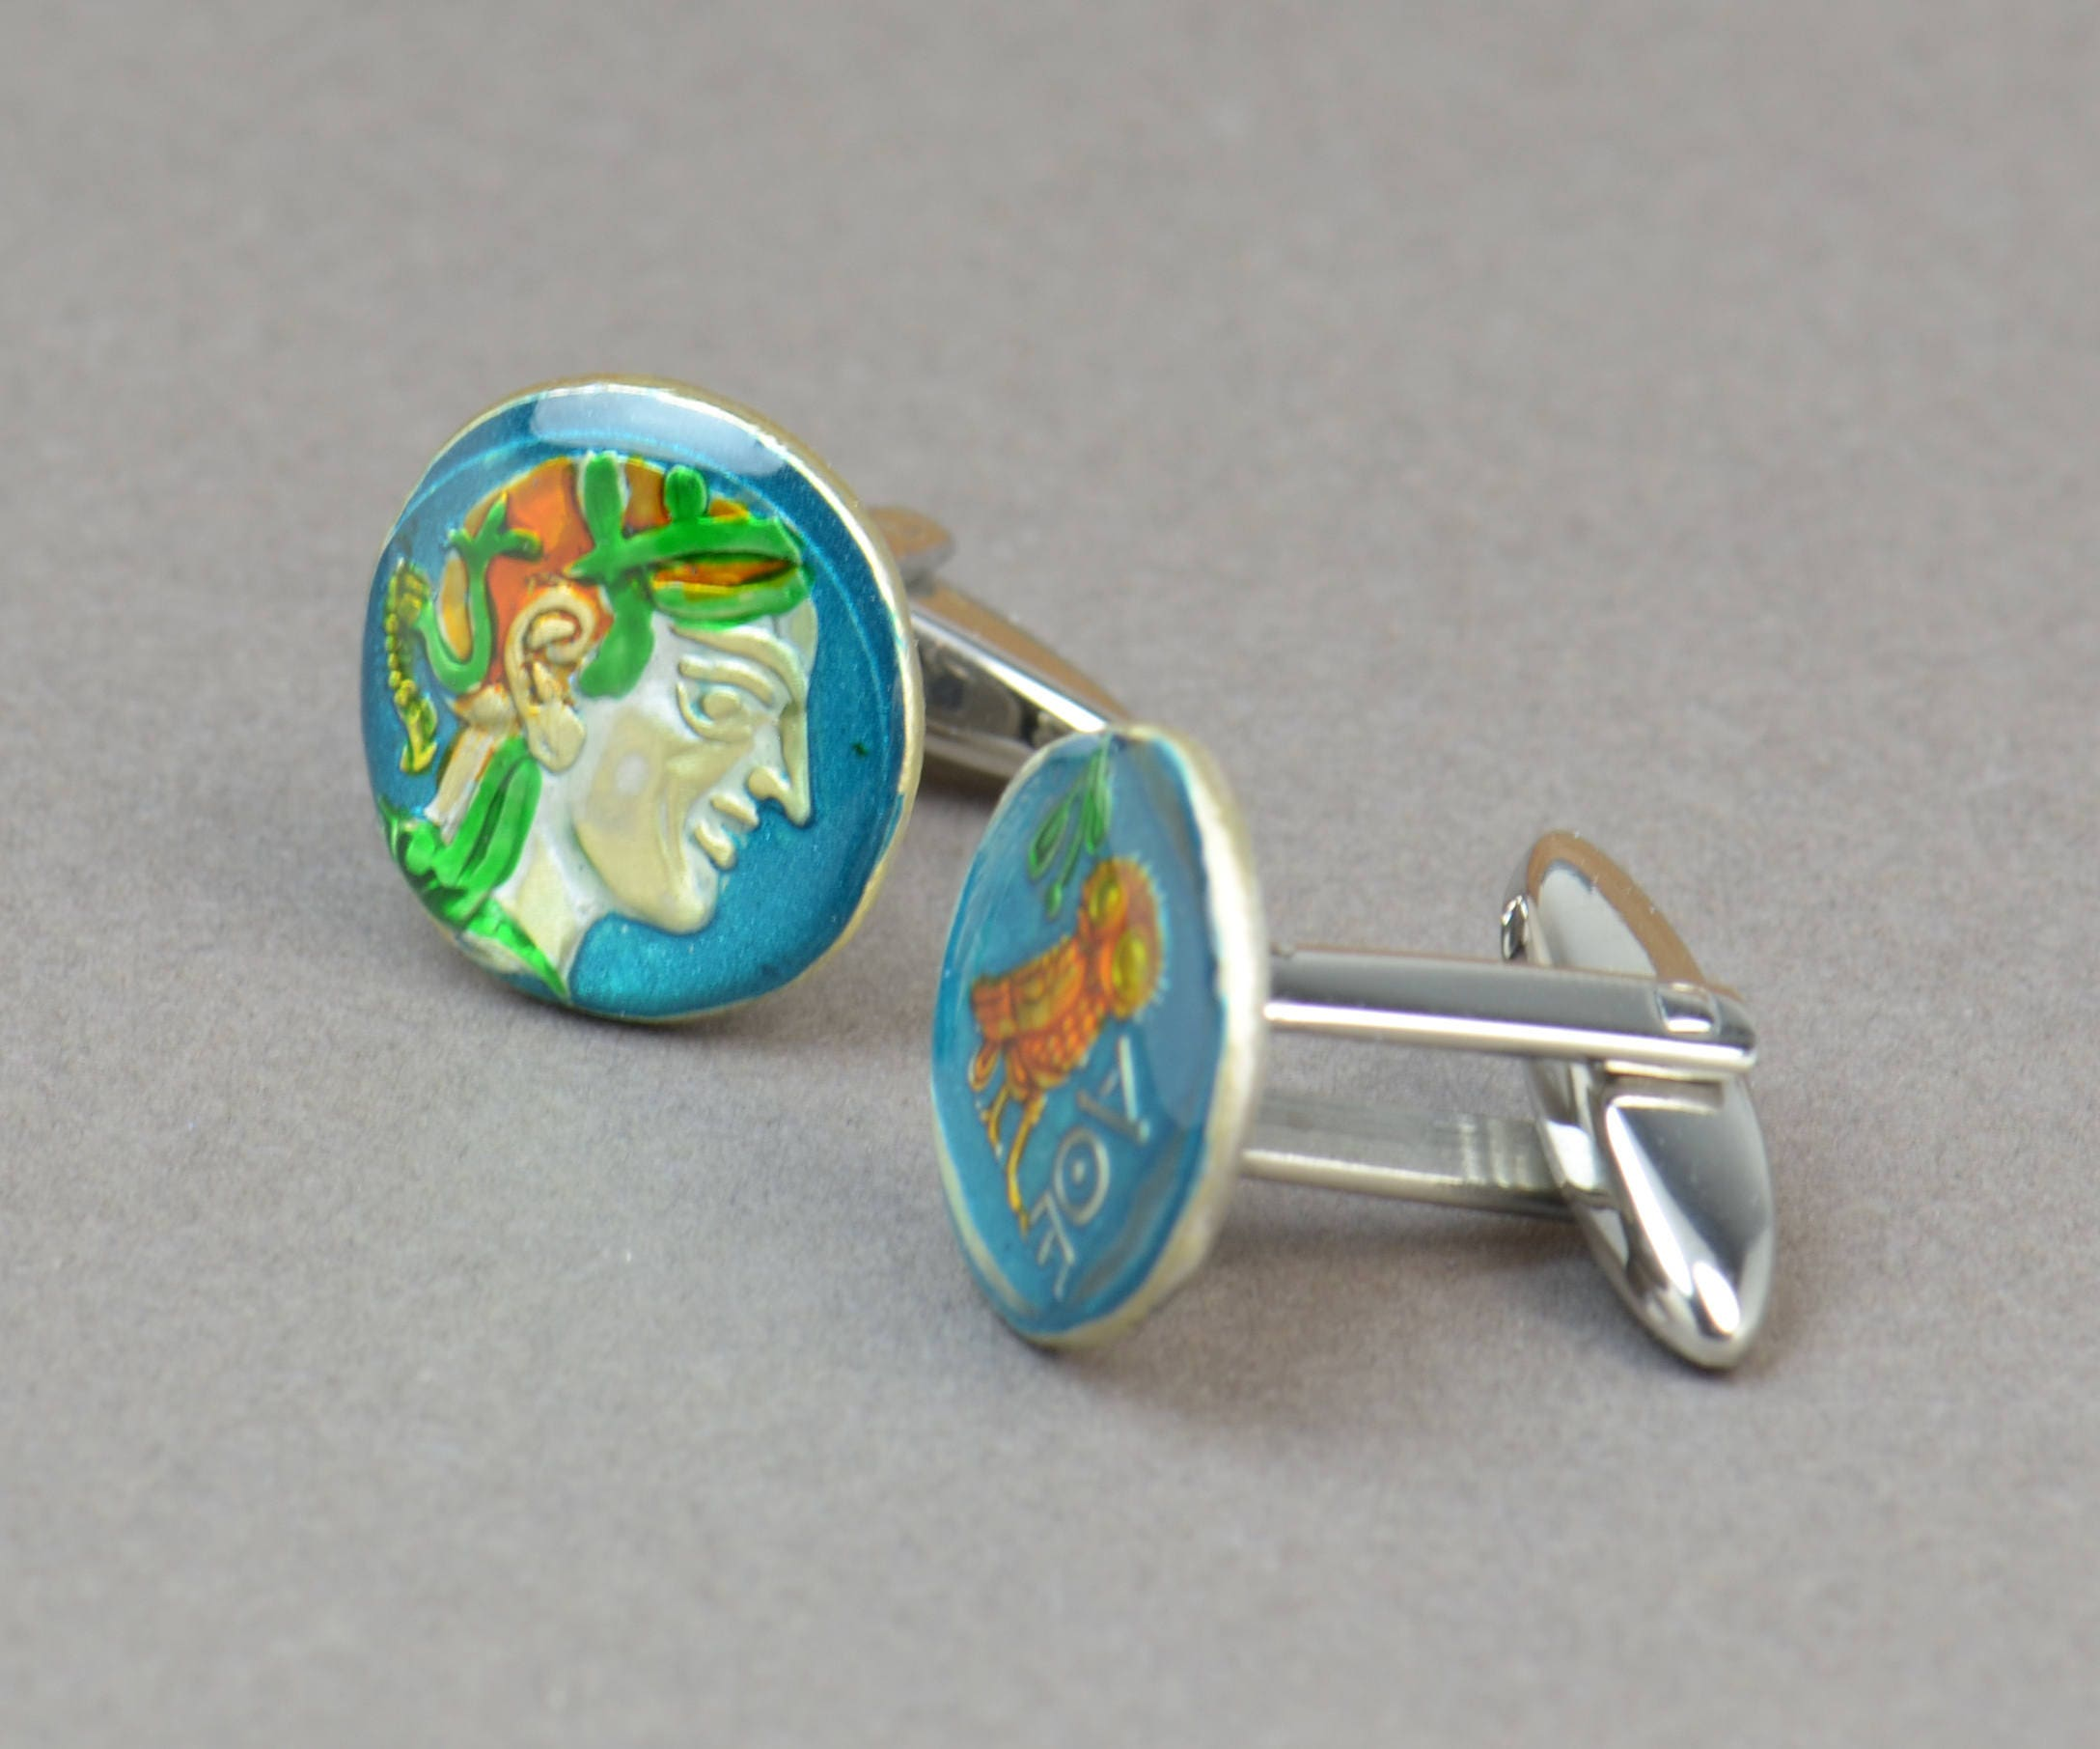 Greece Athens Drachm 5th century Cufflinks.Greek Drachma.Cuff links accessories mens gift jewelry